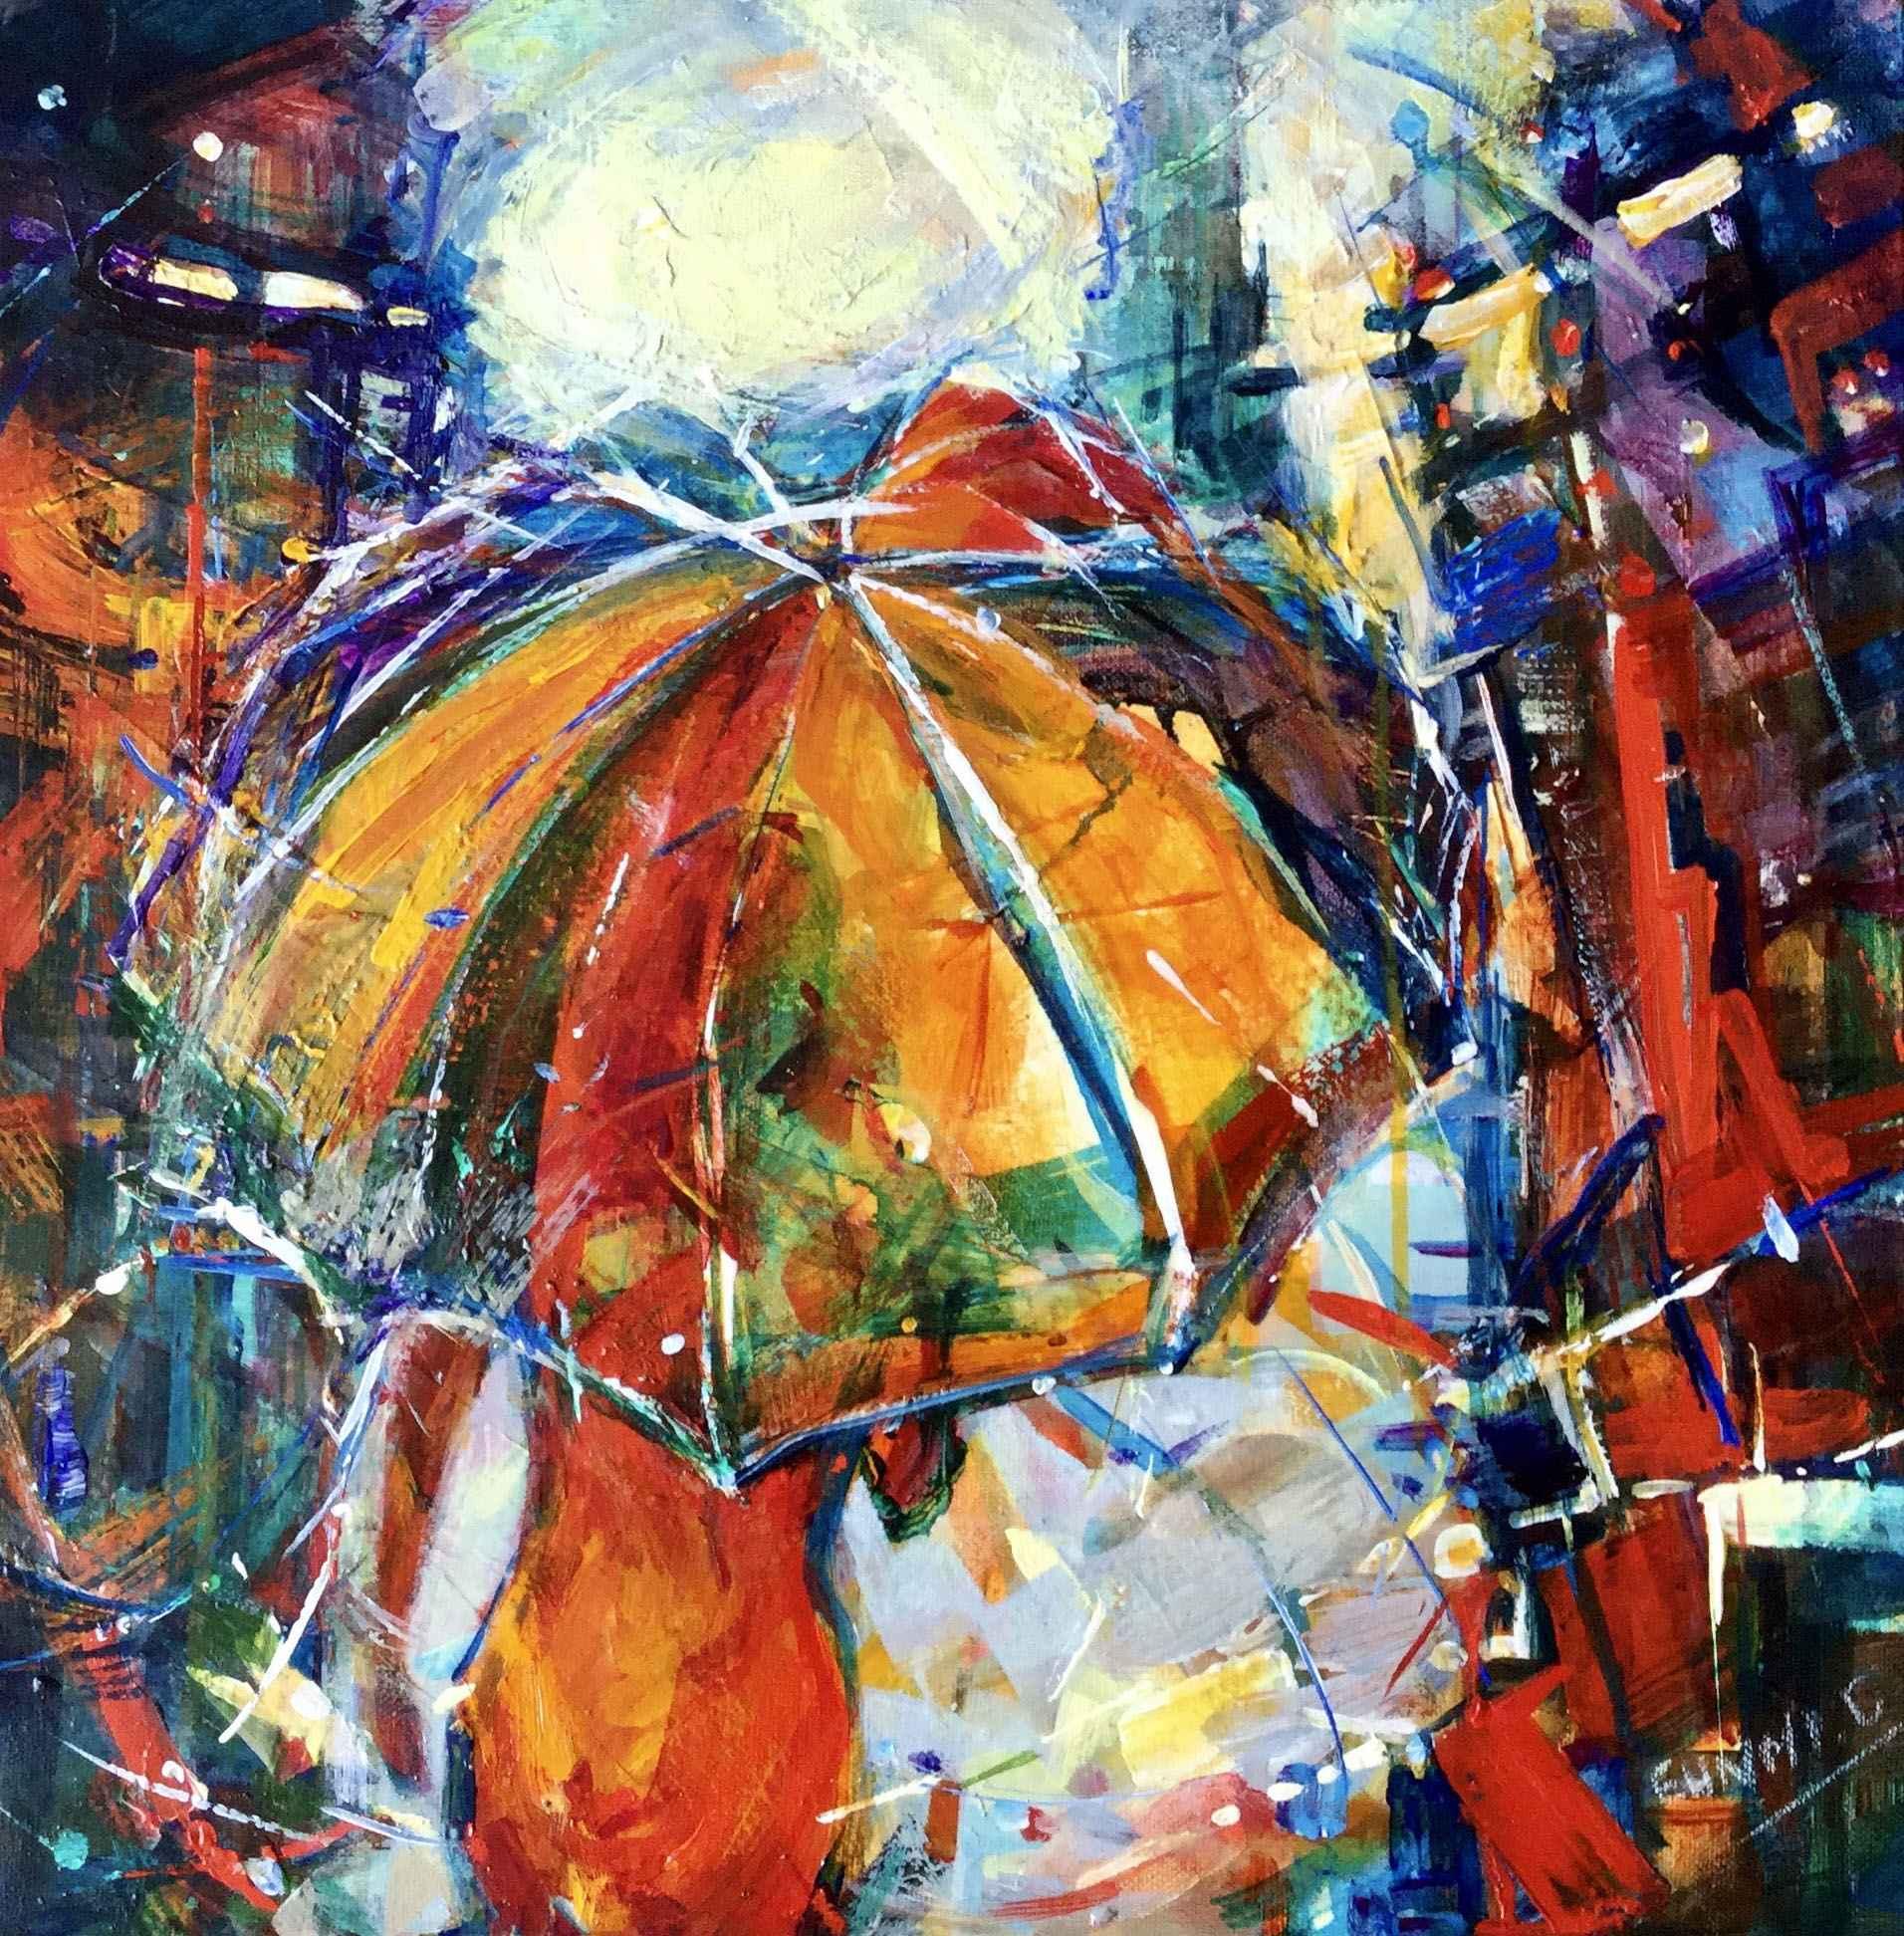 Yellow Umbrella by  Eunmi Conacher - Masterpiece Online